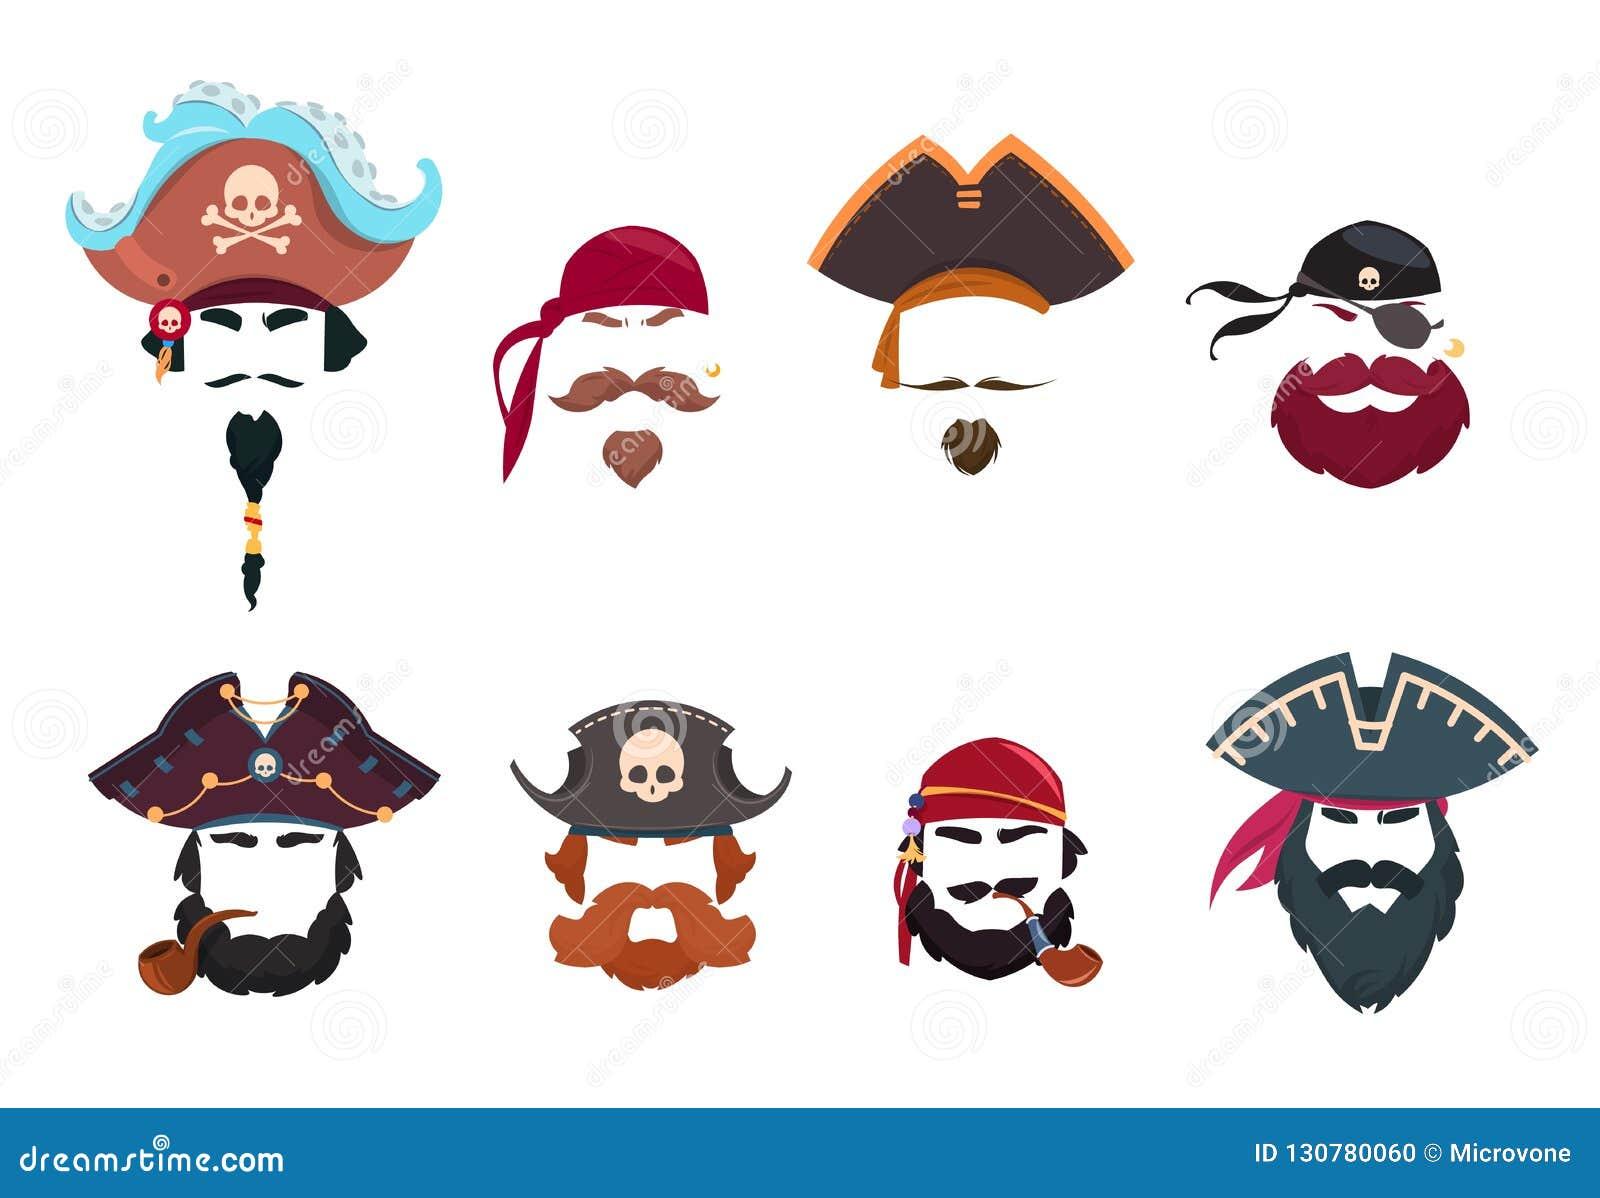 Pirate Mask  Funny Face Photo Filters  Pirates Hats, Bandana And